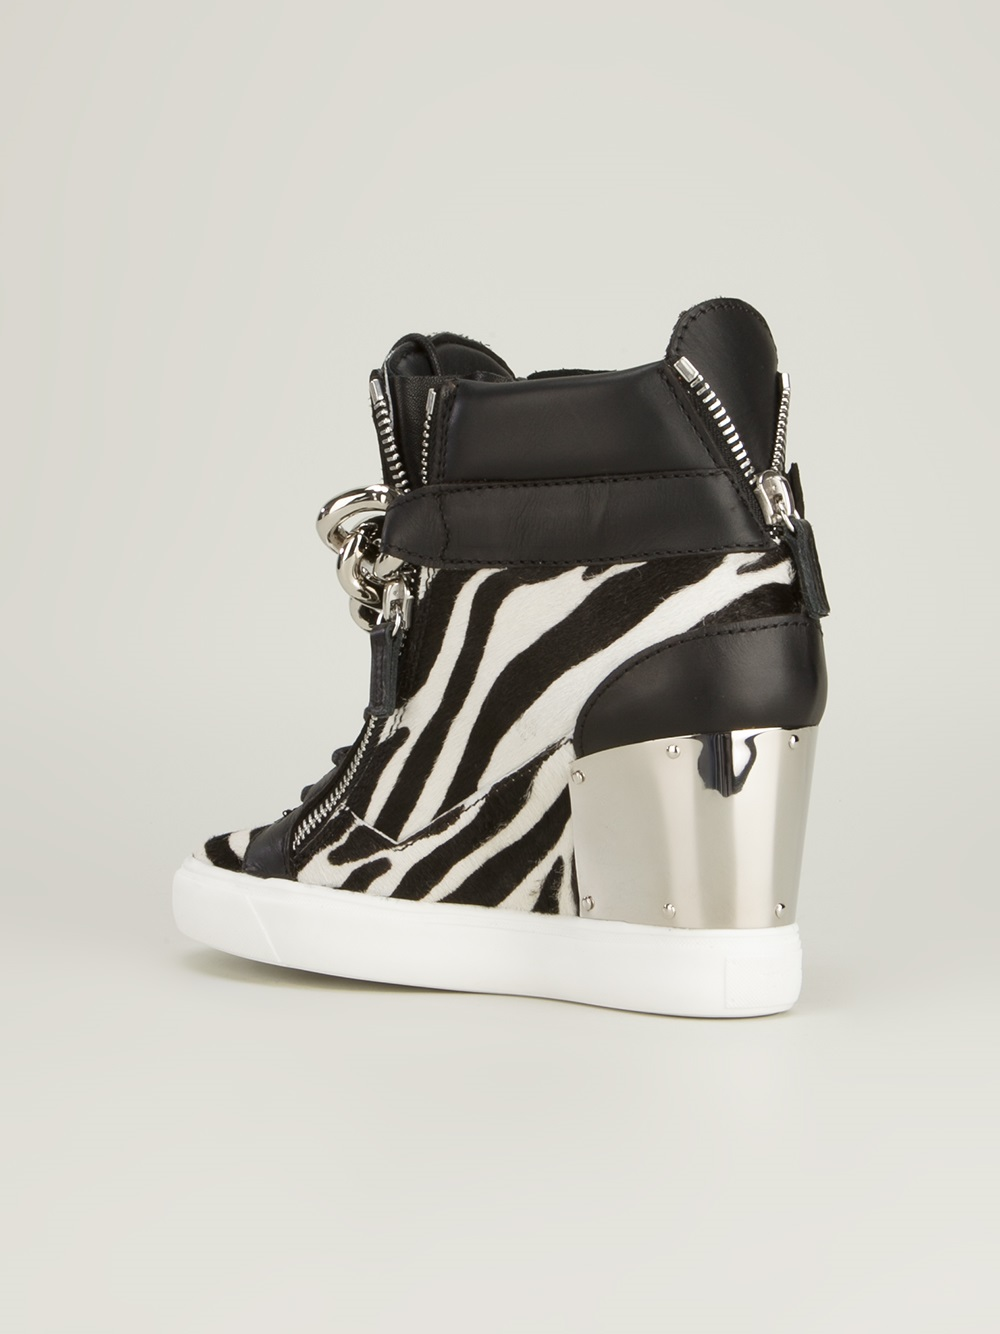 fdafed92fdc41 Giuseppe Zanotti Zebra Print Wedge Trainer in White - Lyst